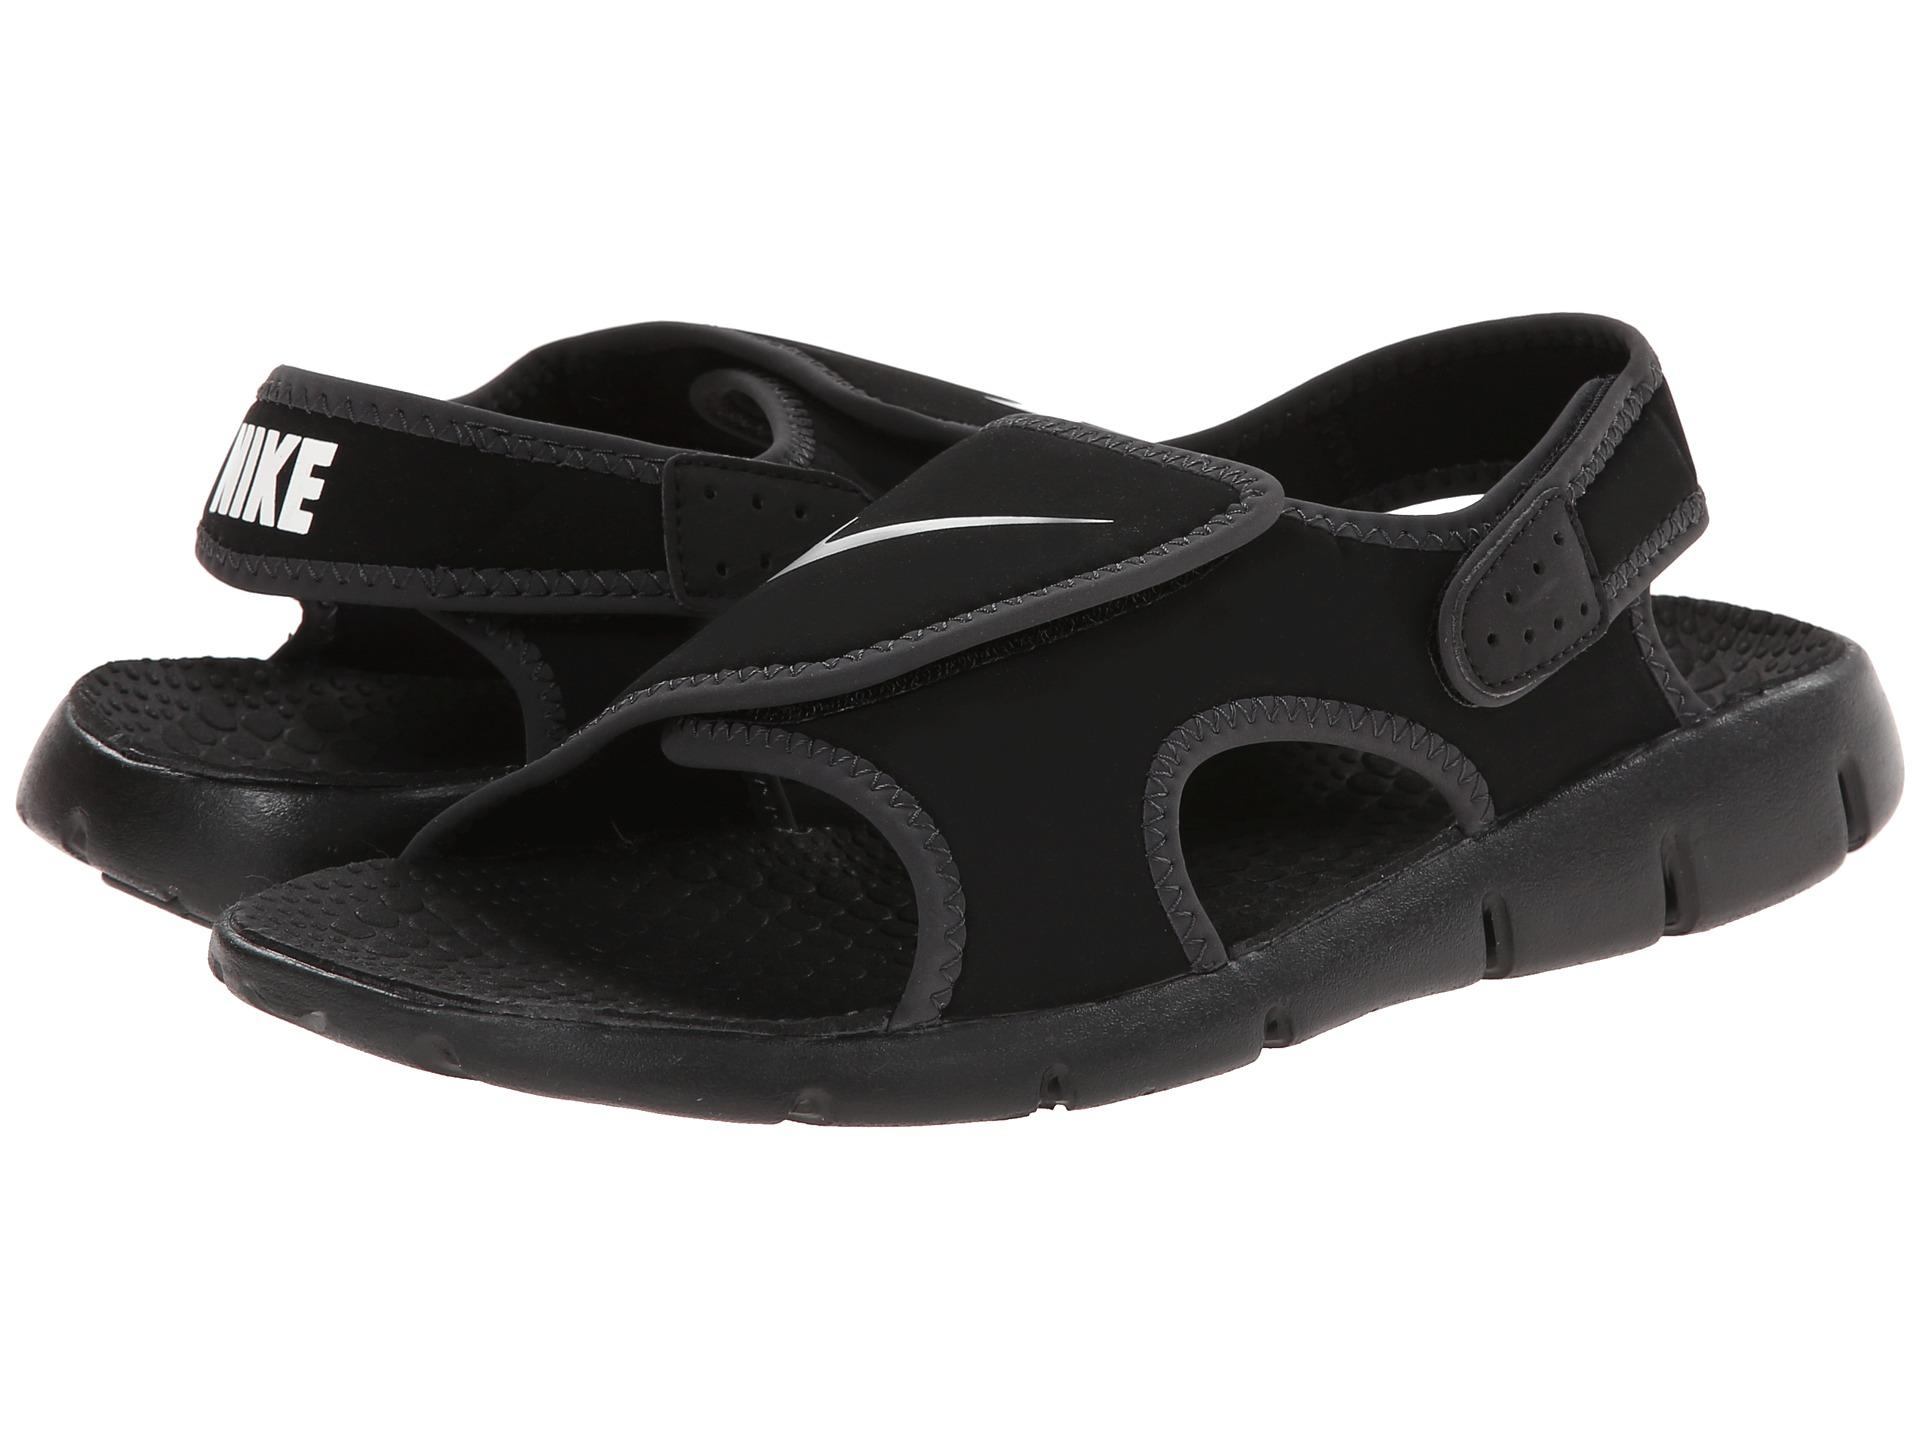 nike air max courir examen Lite - Nike Kids Sunray Adjust 4 (Little Kid/Big Kid) - Zappos.com Free ...